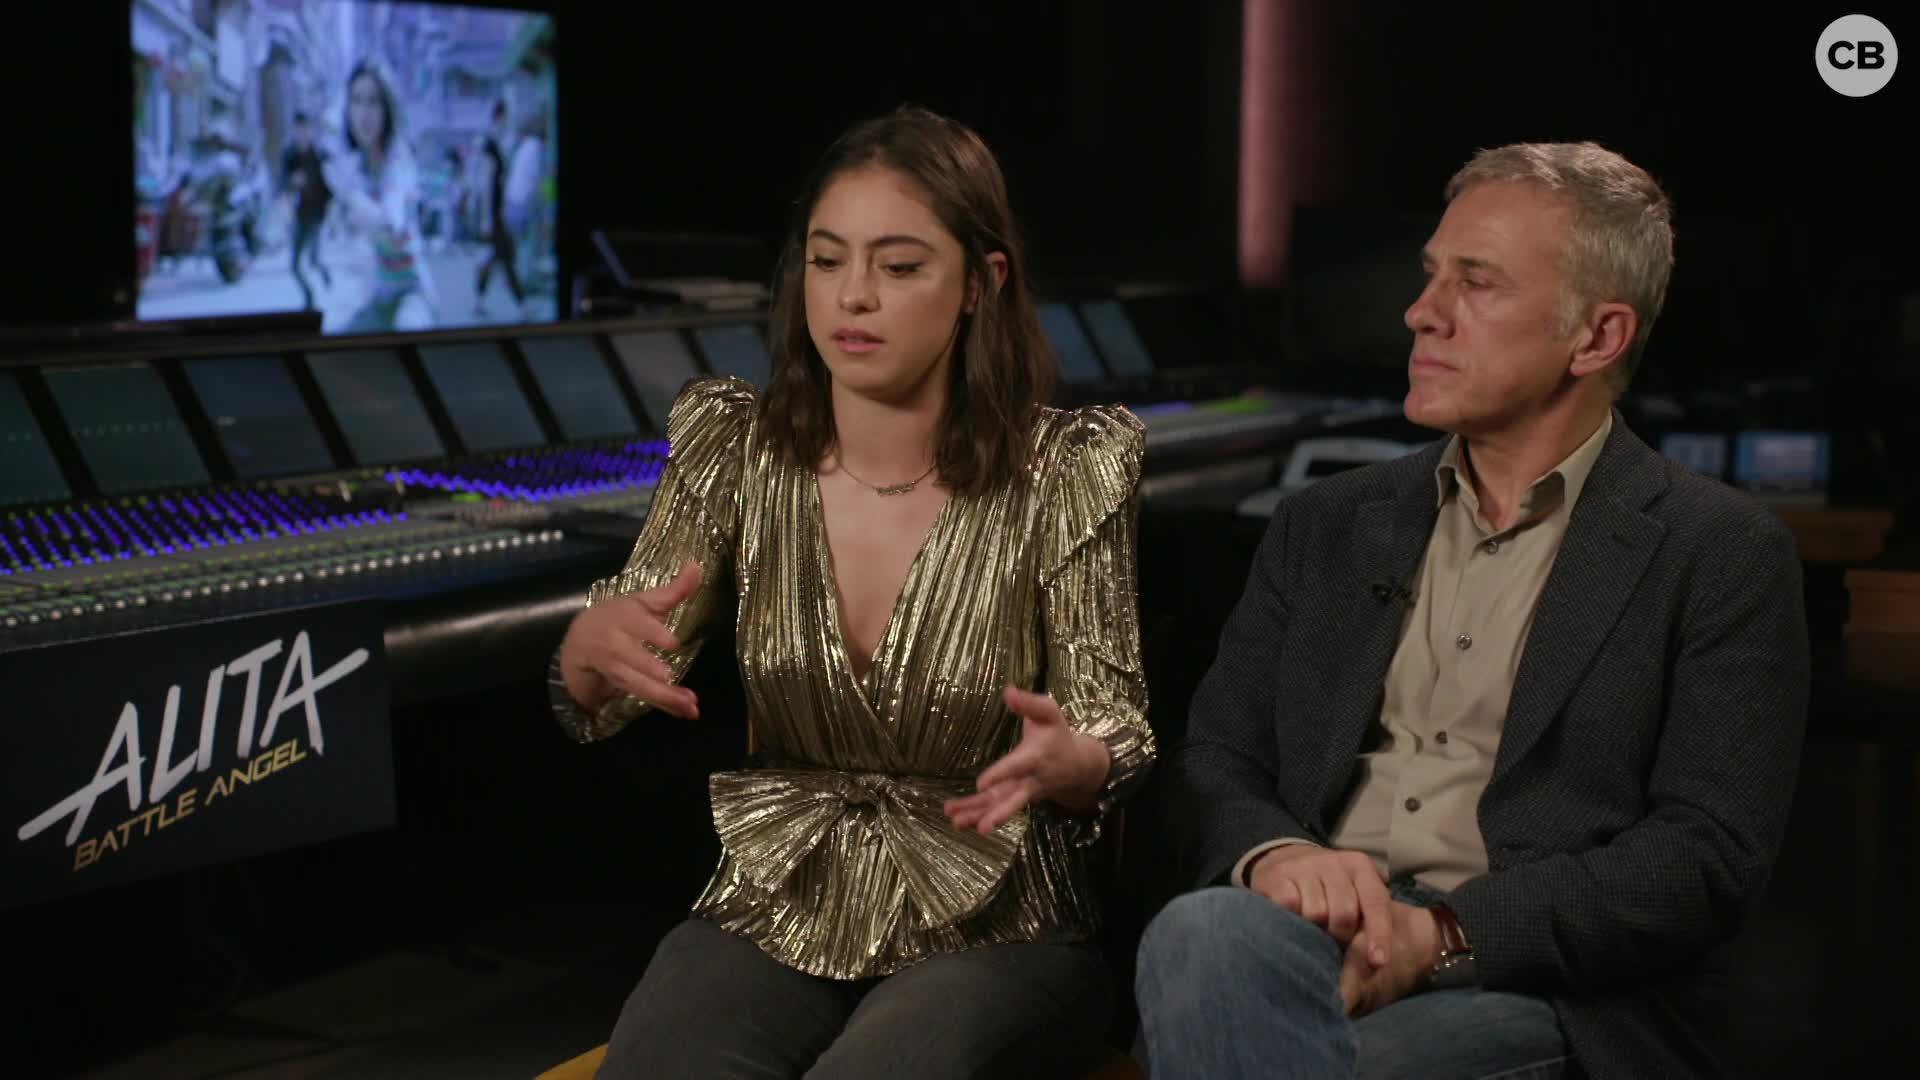 Rosa Salazar and Christoph Waltz Talk 'Alita: Battle Angel' screen capture